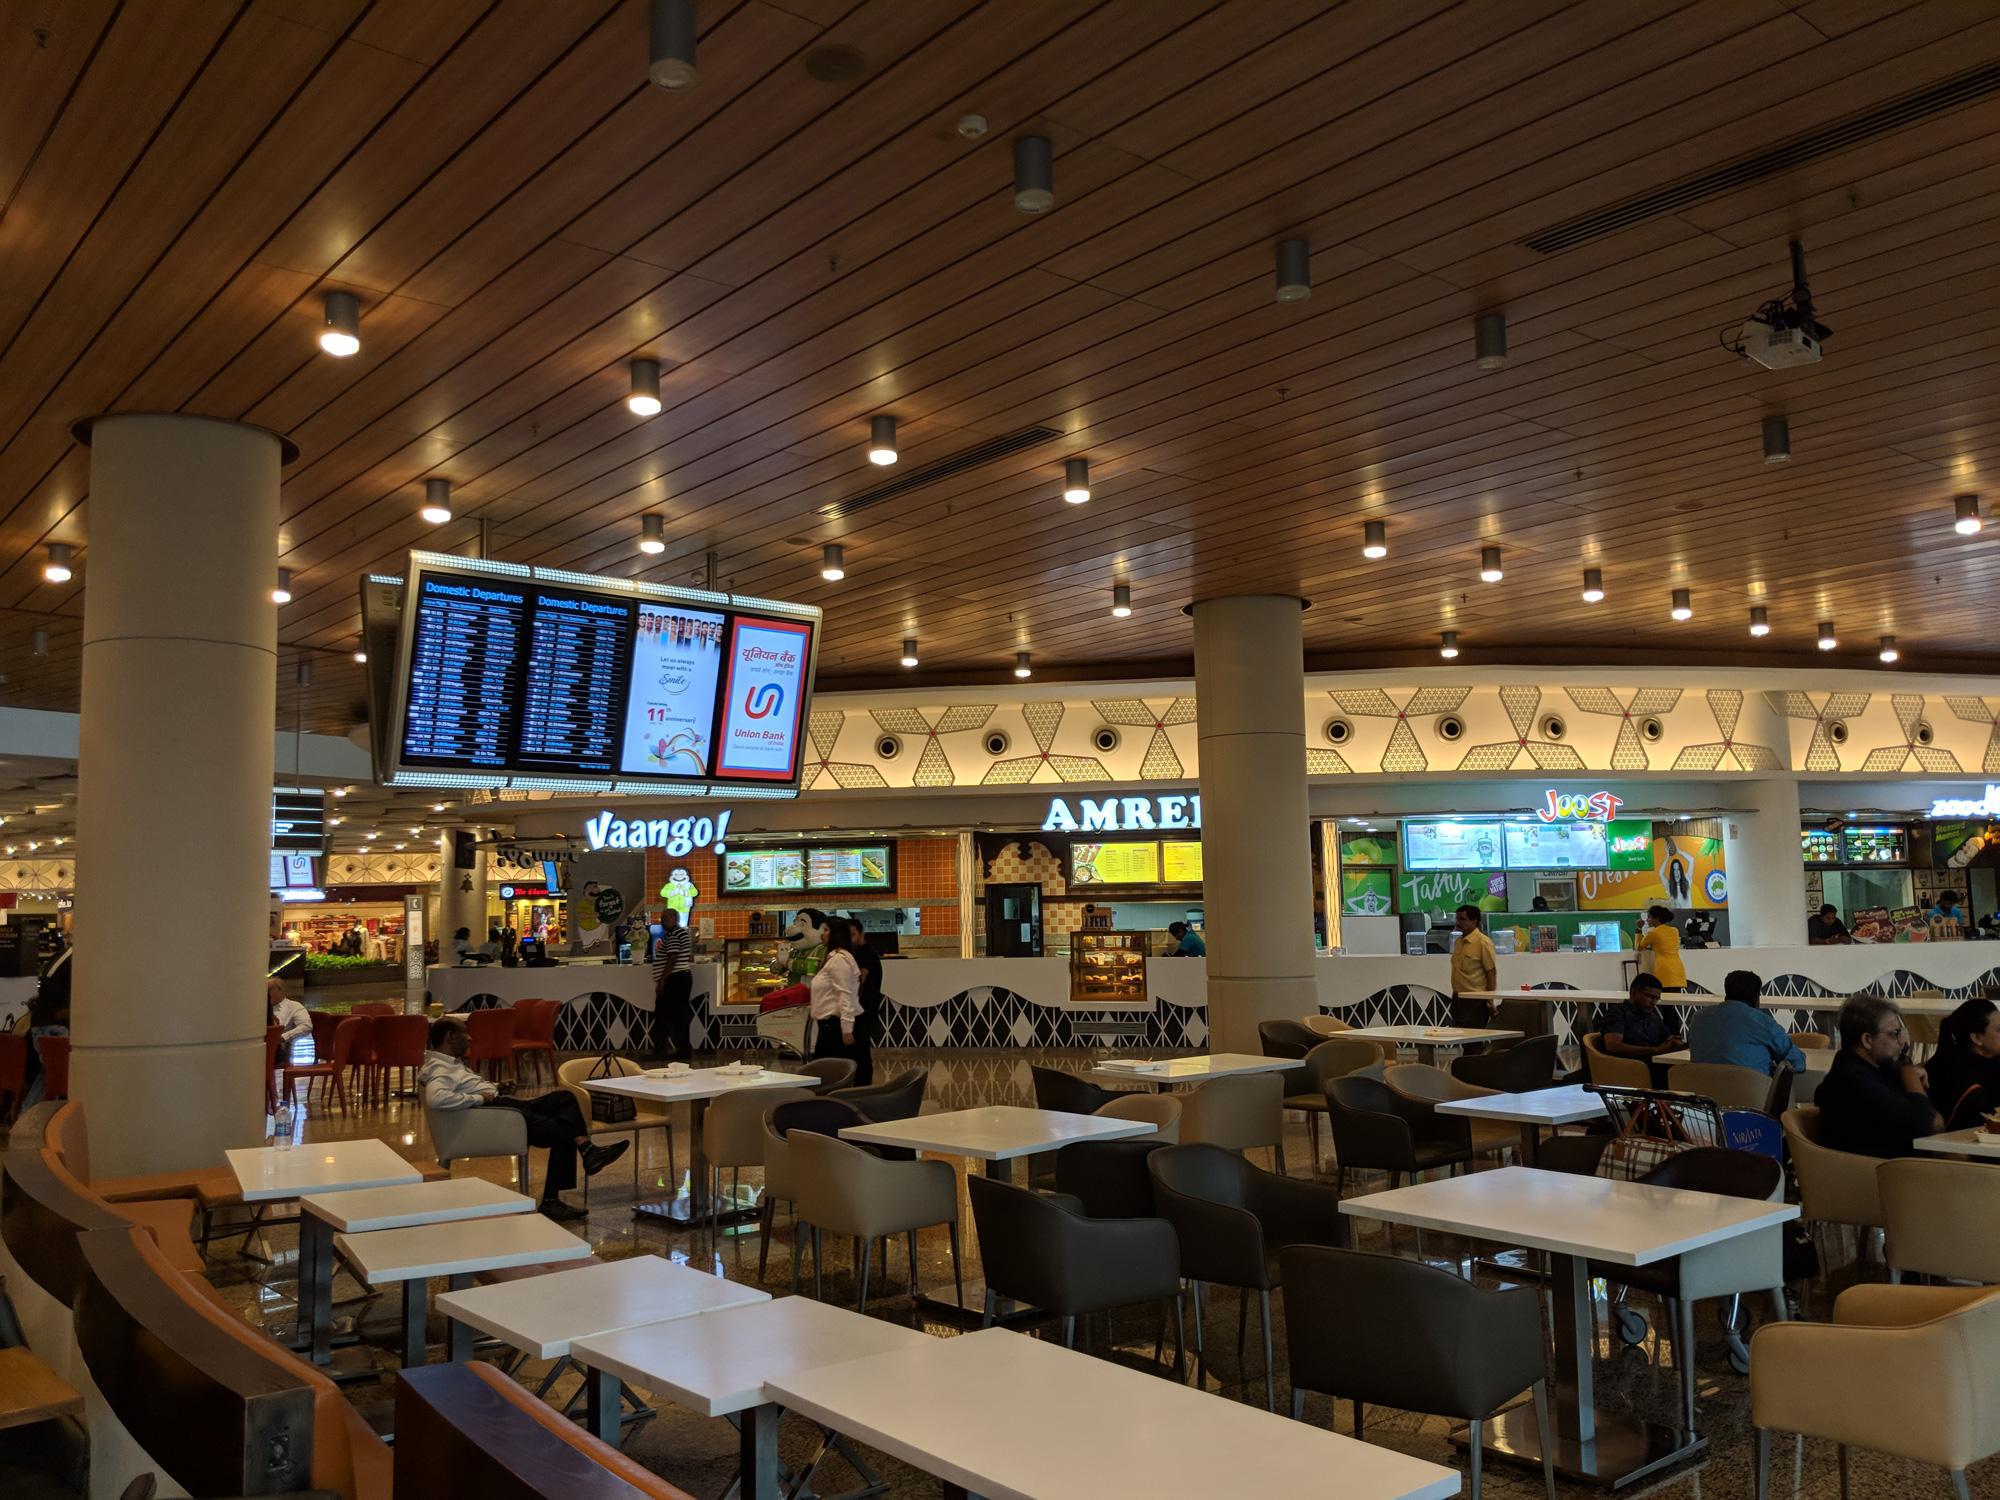 Mumbai T2 Airport